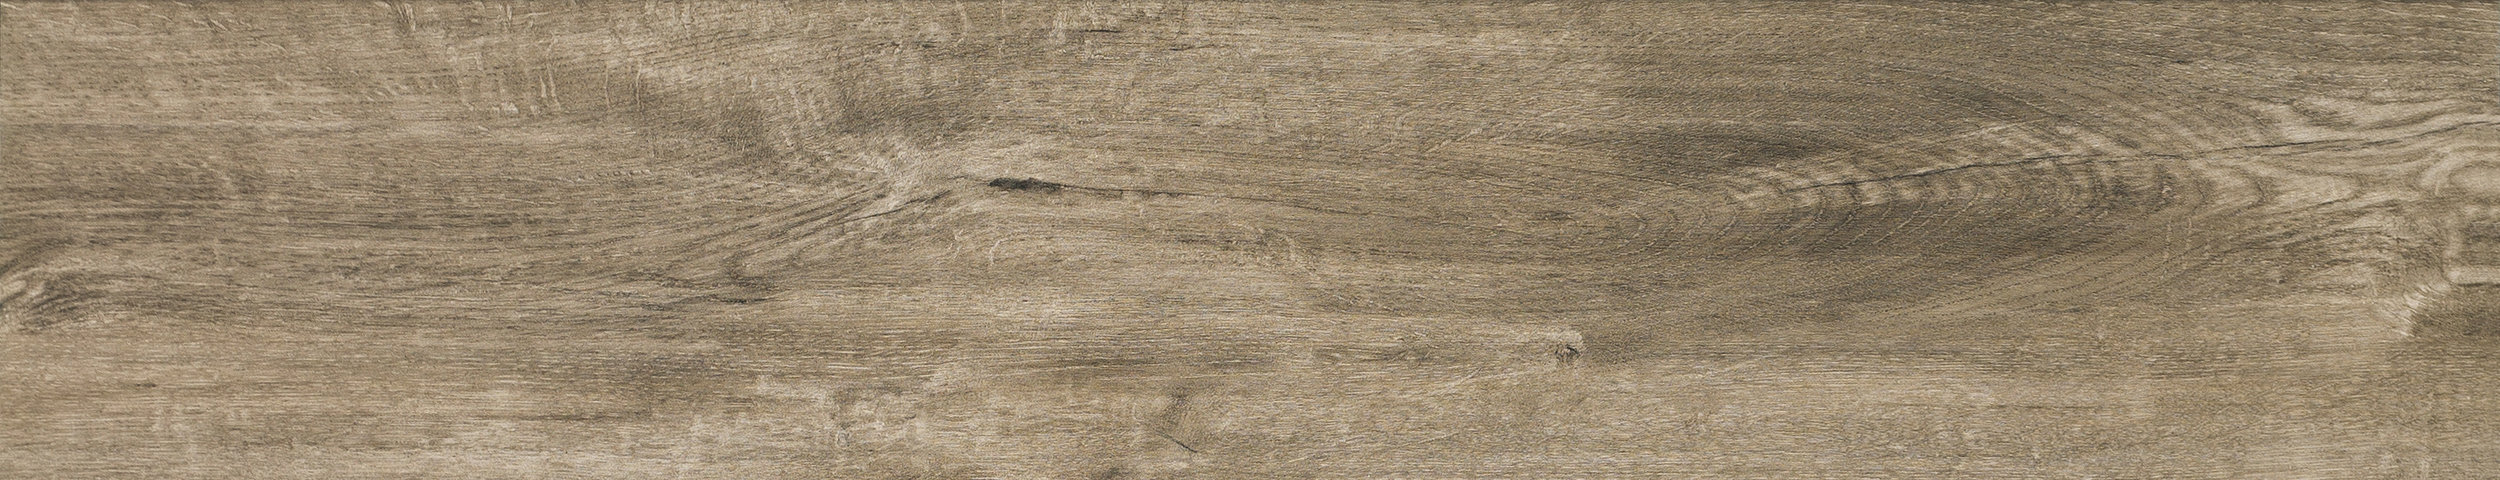 "log wood 6.5"" x 39.25"" gray"